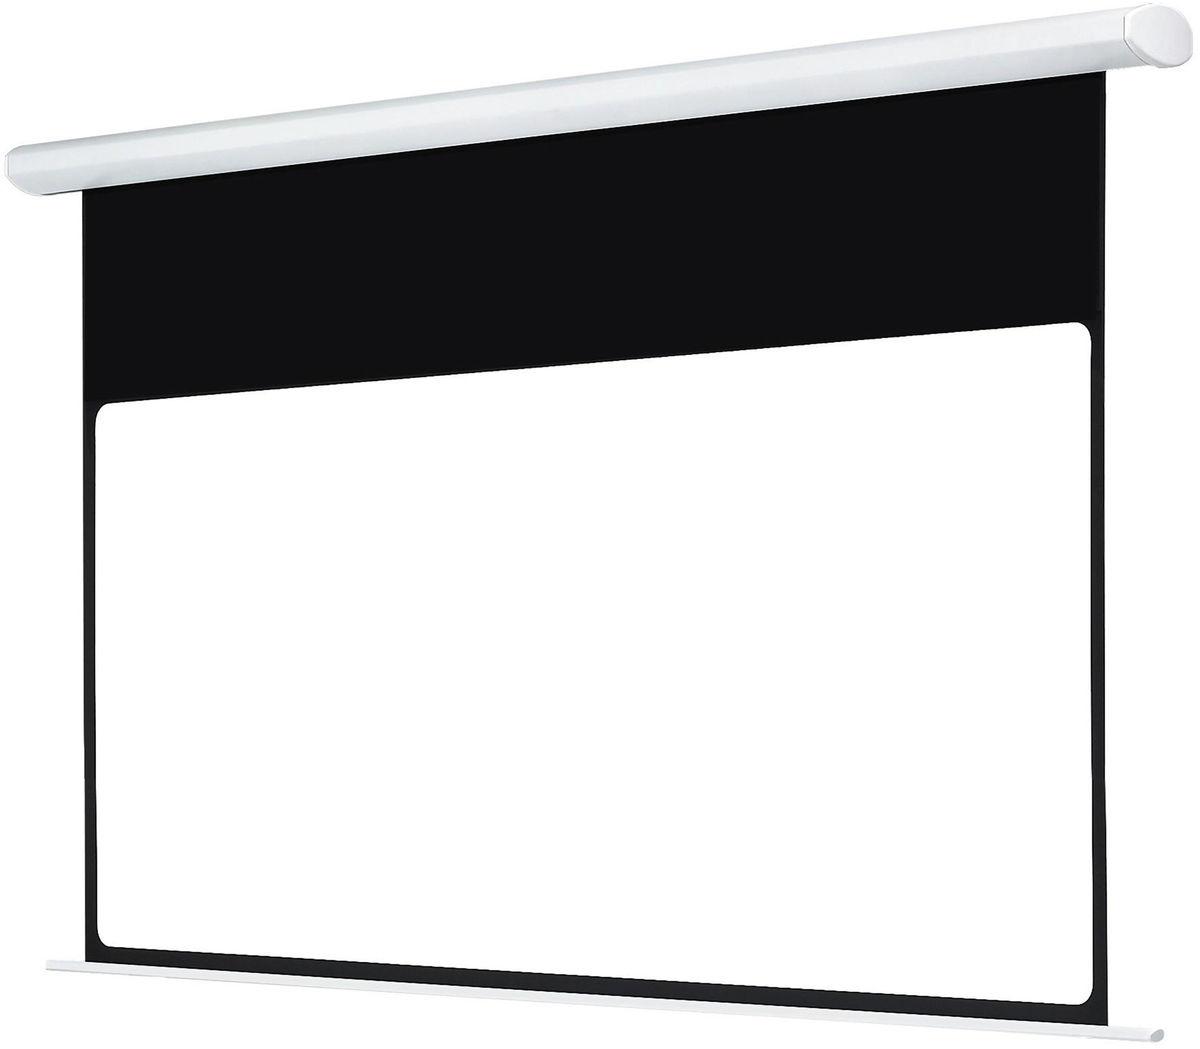 oray hcm 4rb 16 9 crans de projection son vid. Black Bedroom Furniture Sets. Home Design Ideas